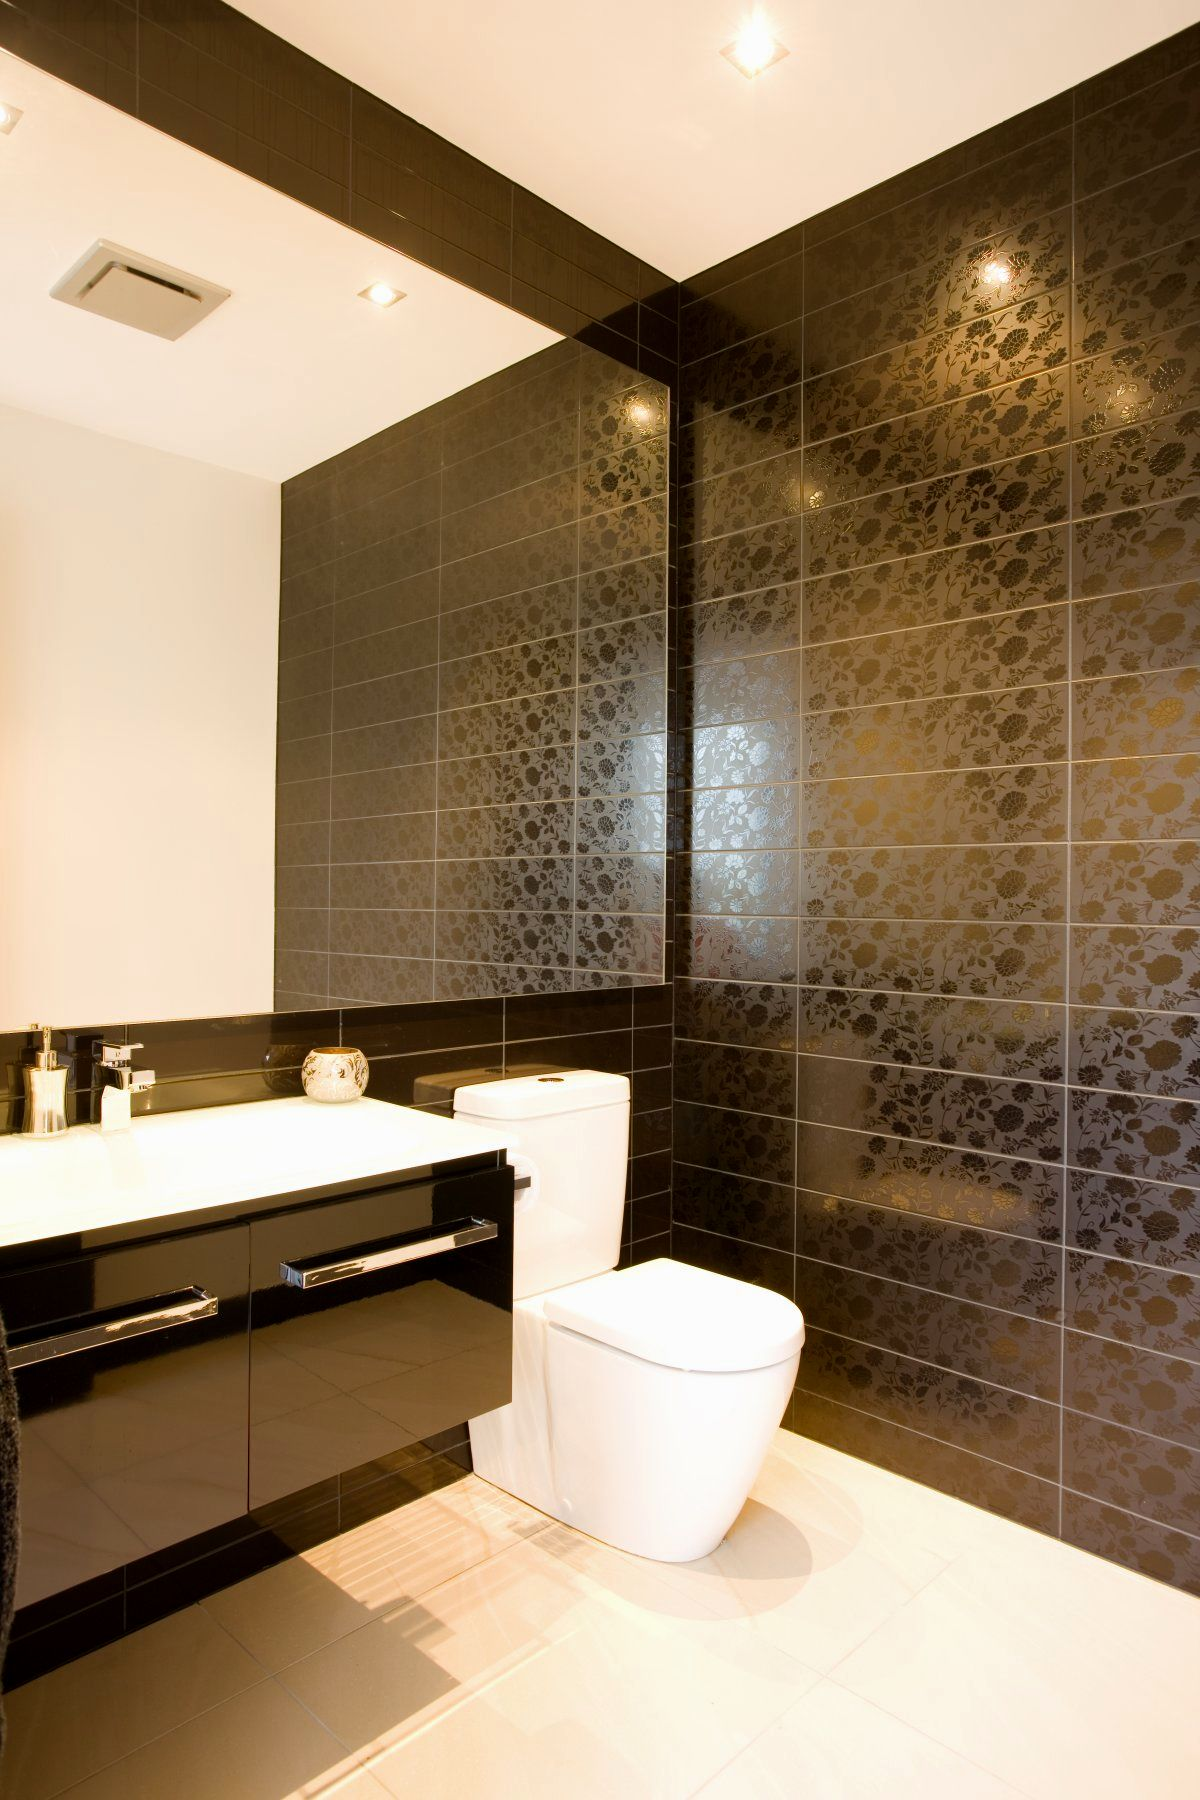 fancy mirror in the bathroom inspiration-Lovely Mirror In the Bathroom Model